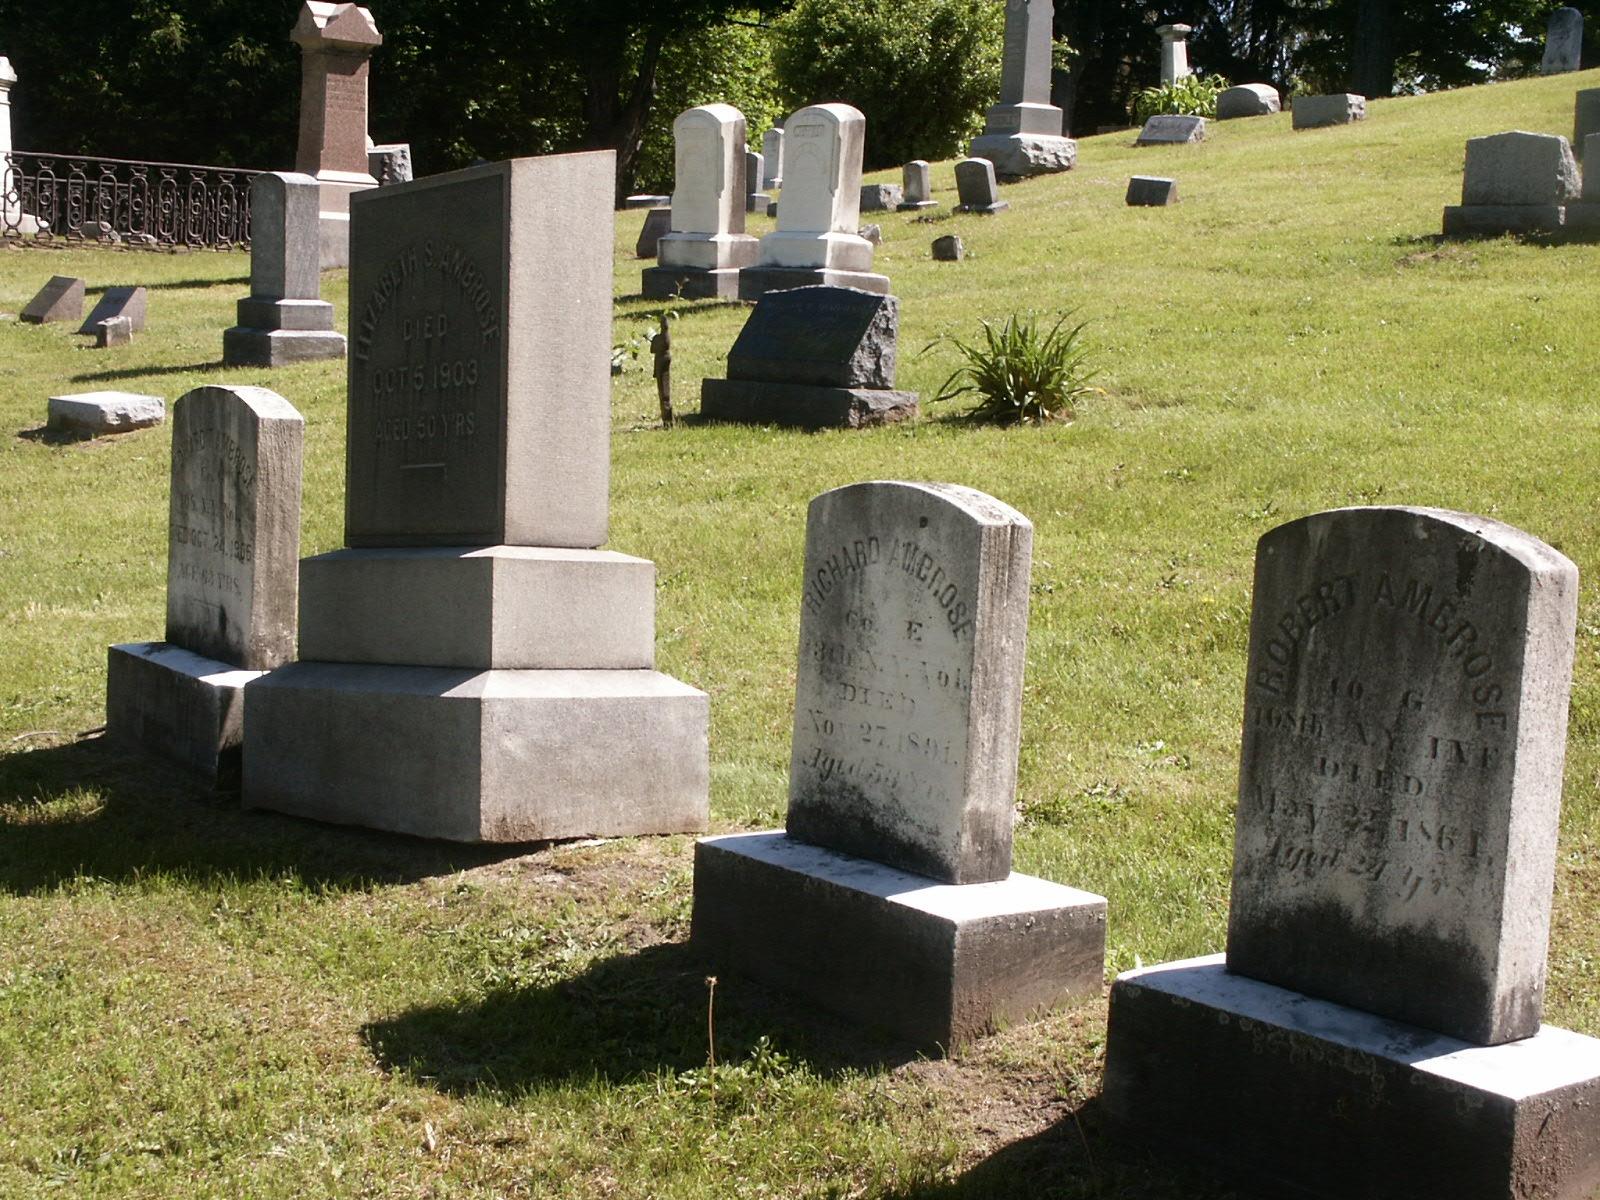 Edward, sister Elizabeth, Richard and Robert Ambrose